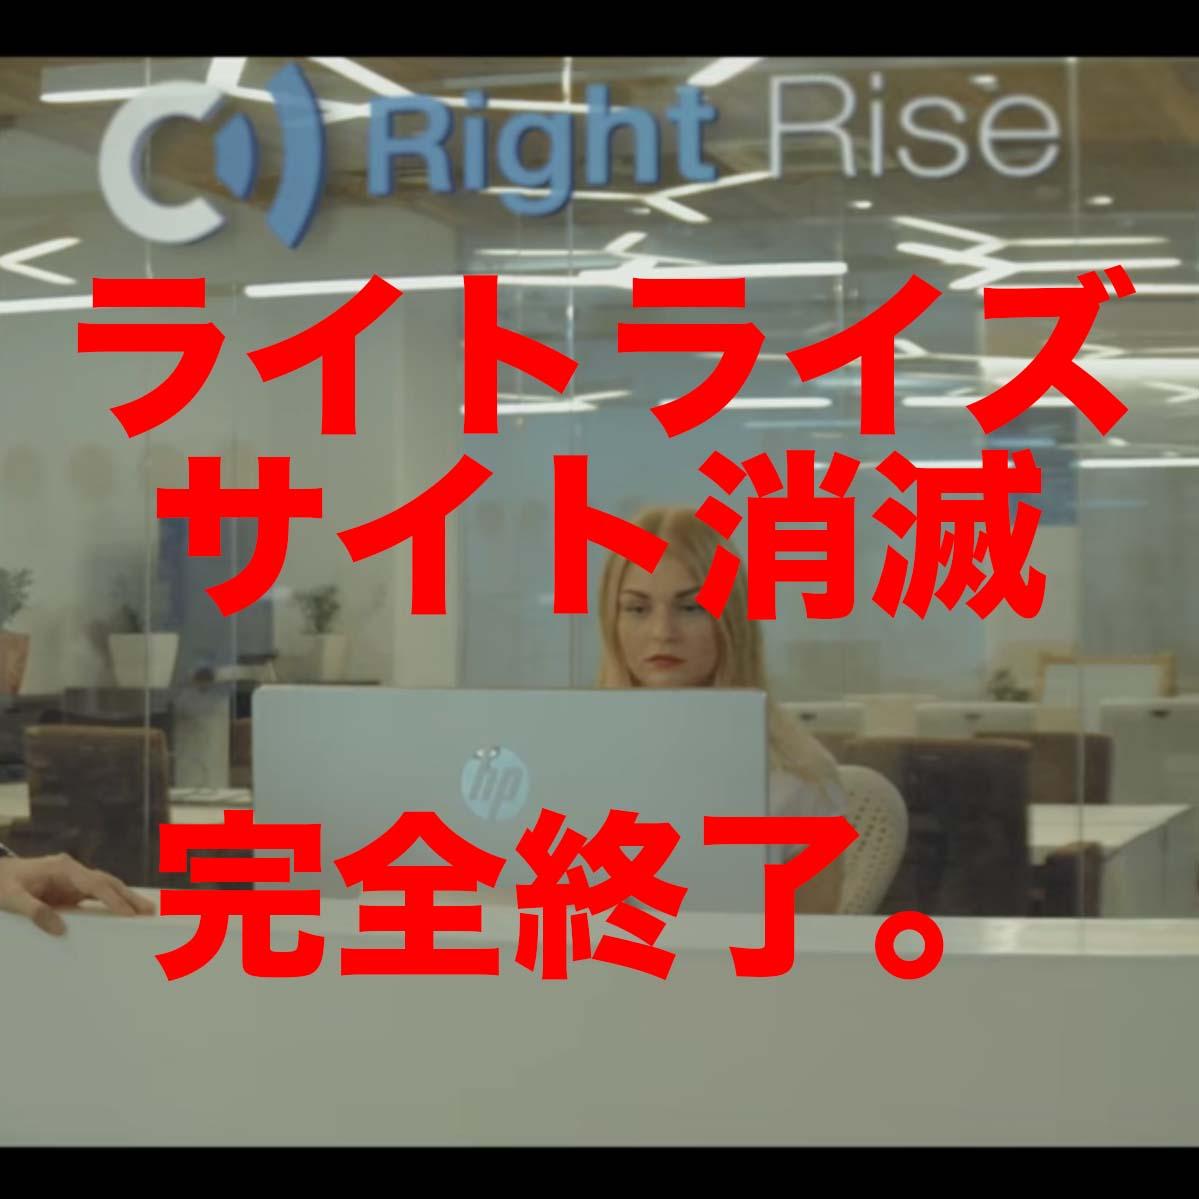 【Right Rise/ライトライズ】サイト削除で完全終了  幻の元本12万円と月利30%…